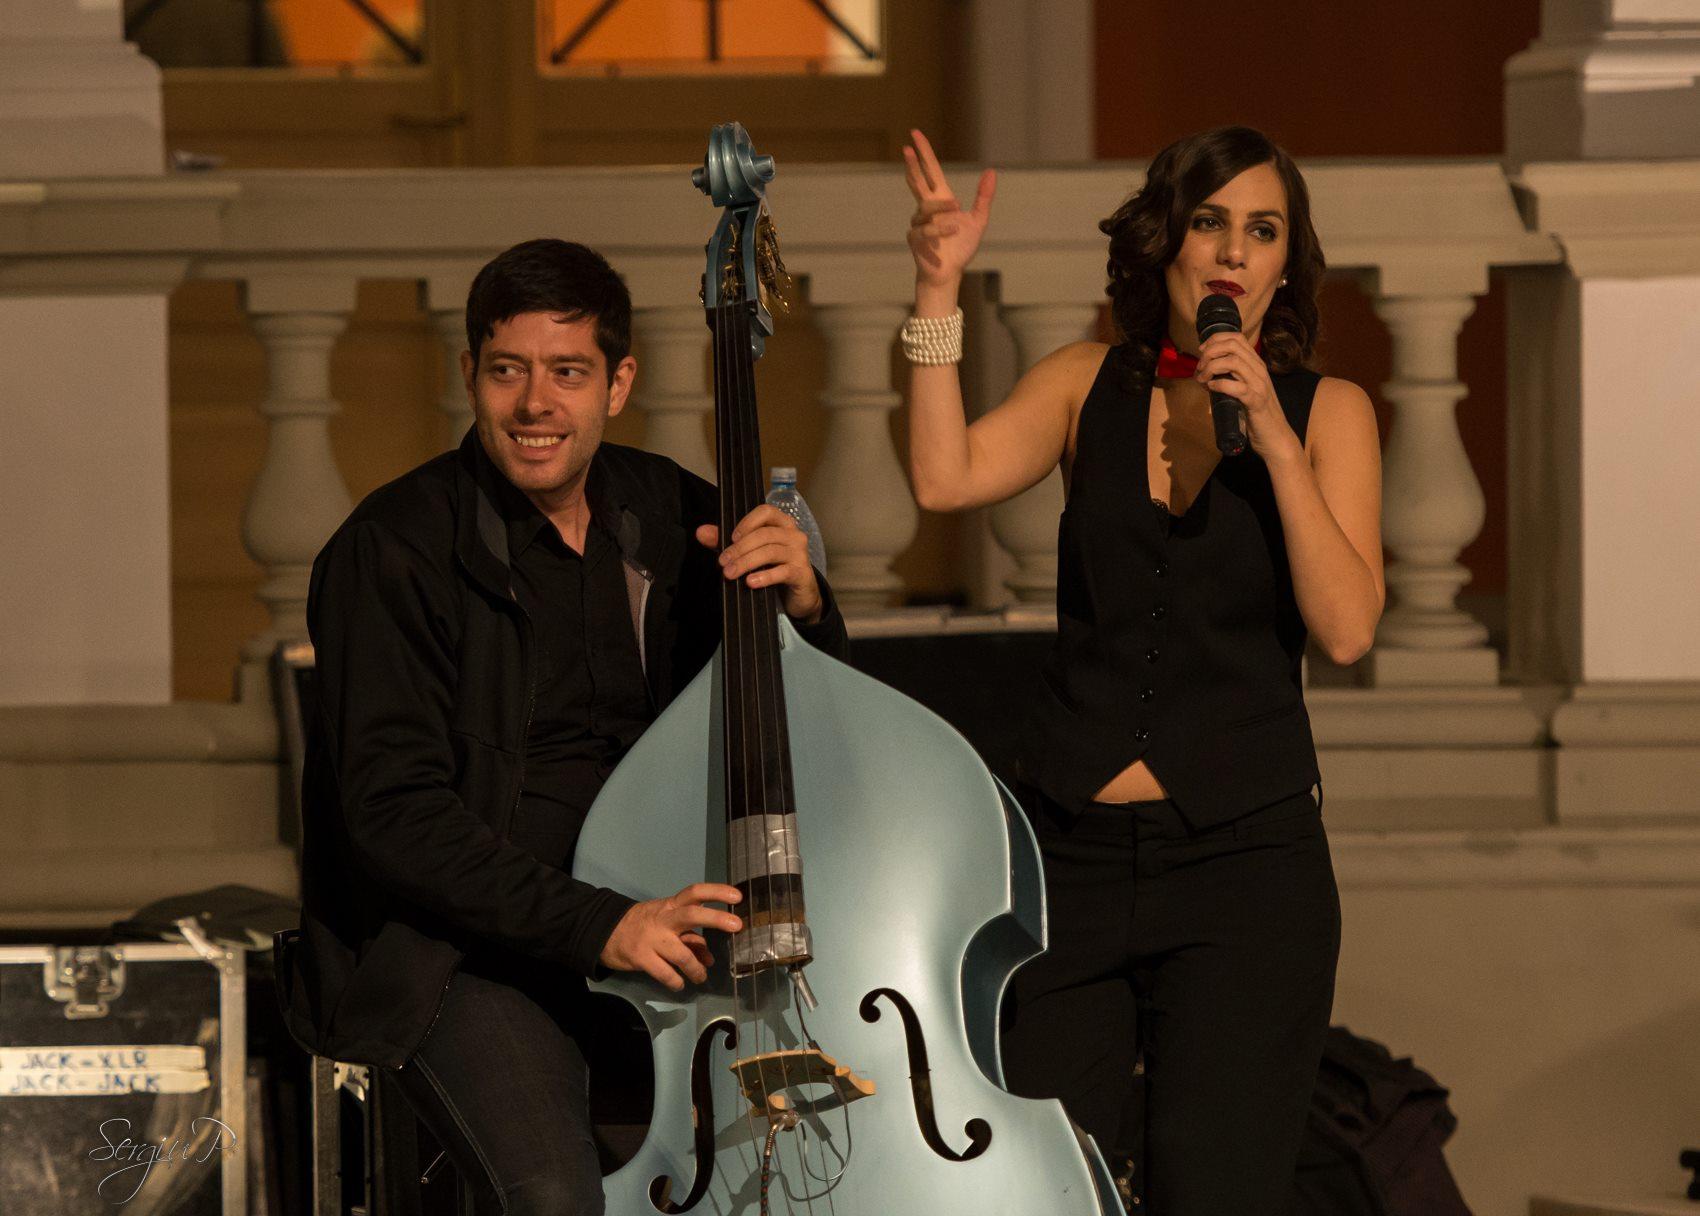 Ciprian Parghel canta alaturi de iubita sa, Irina Sarbu foto: Sergiu P